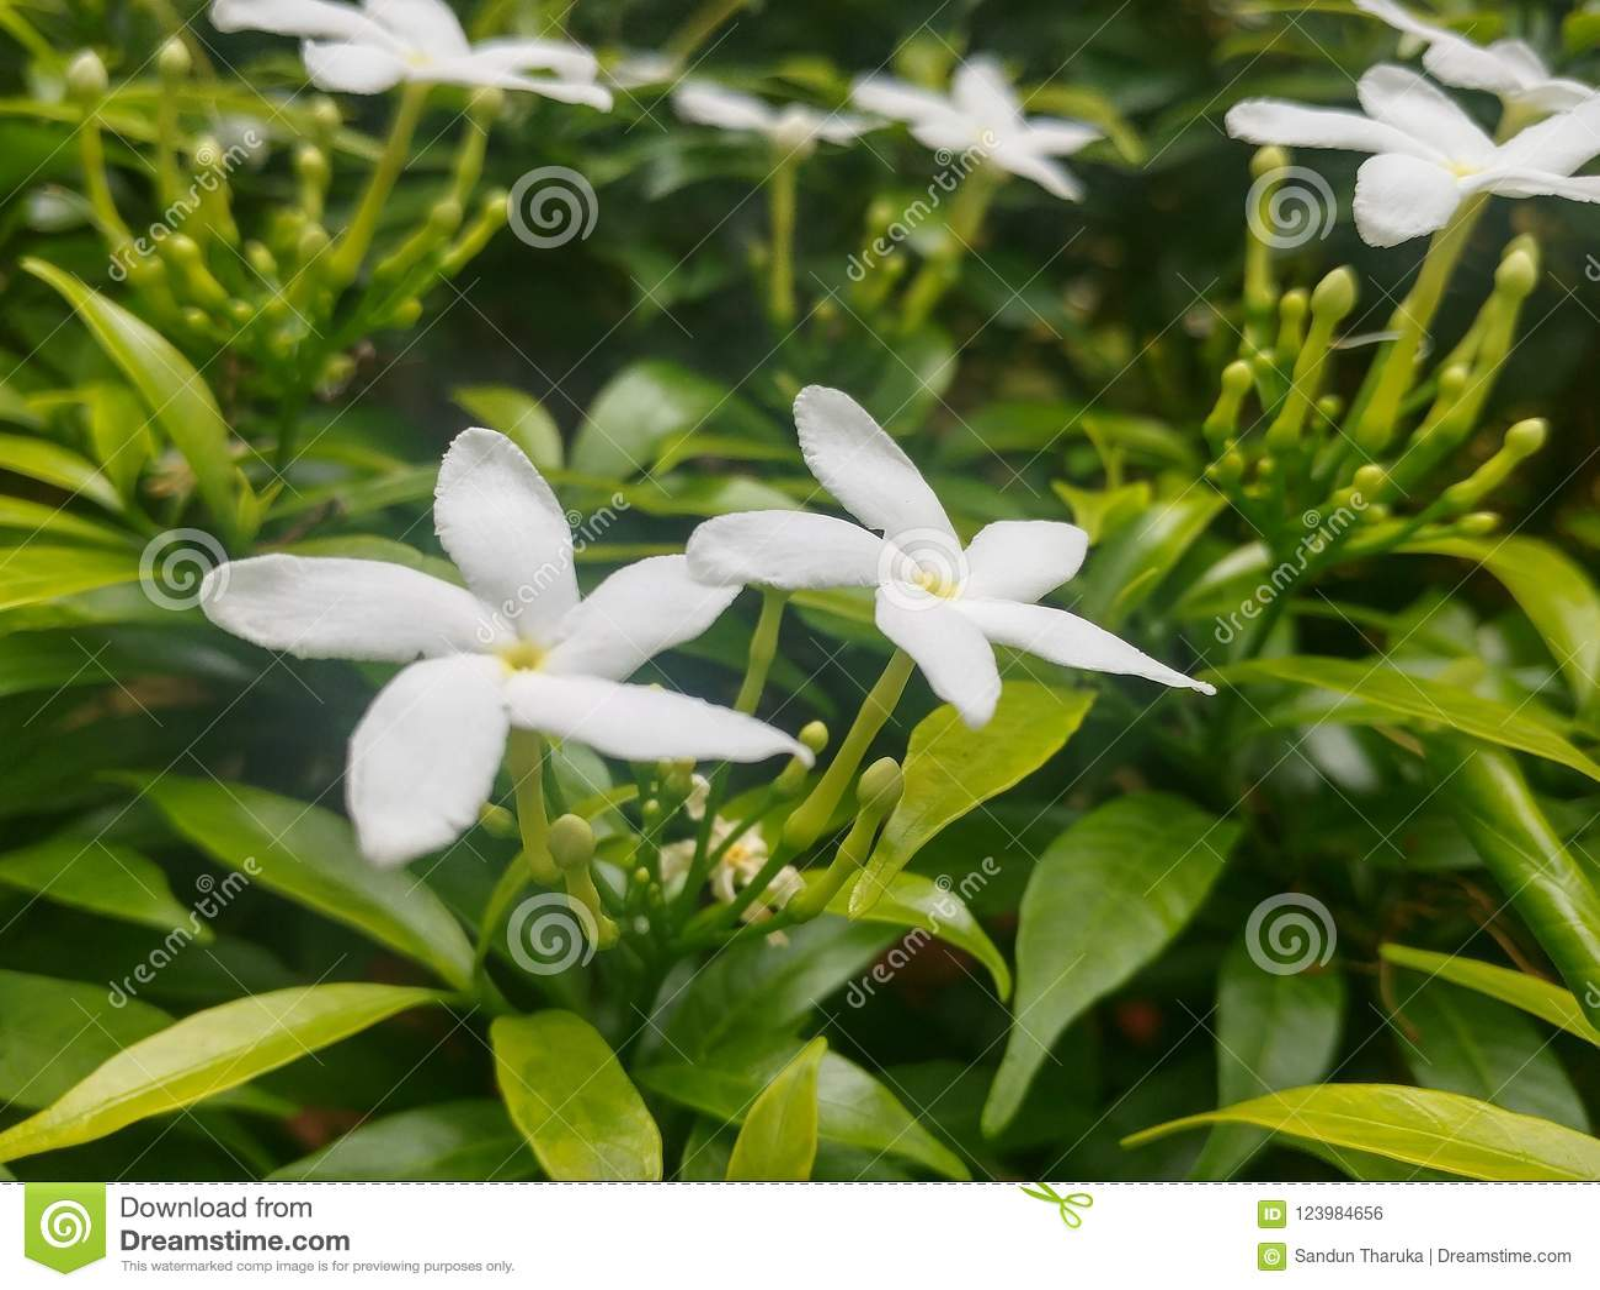 Beautiful white flowers in sri lanka stock photo image of bawan download beautiful white flowers in sri lanka stock photo image of bawan common mightylinksfo